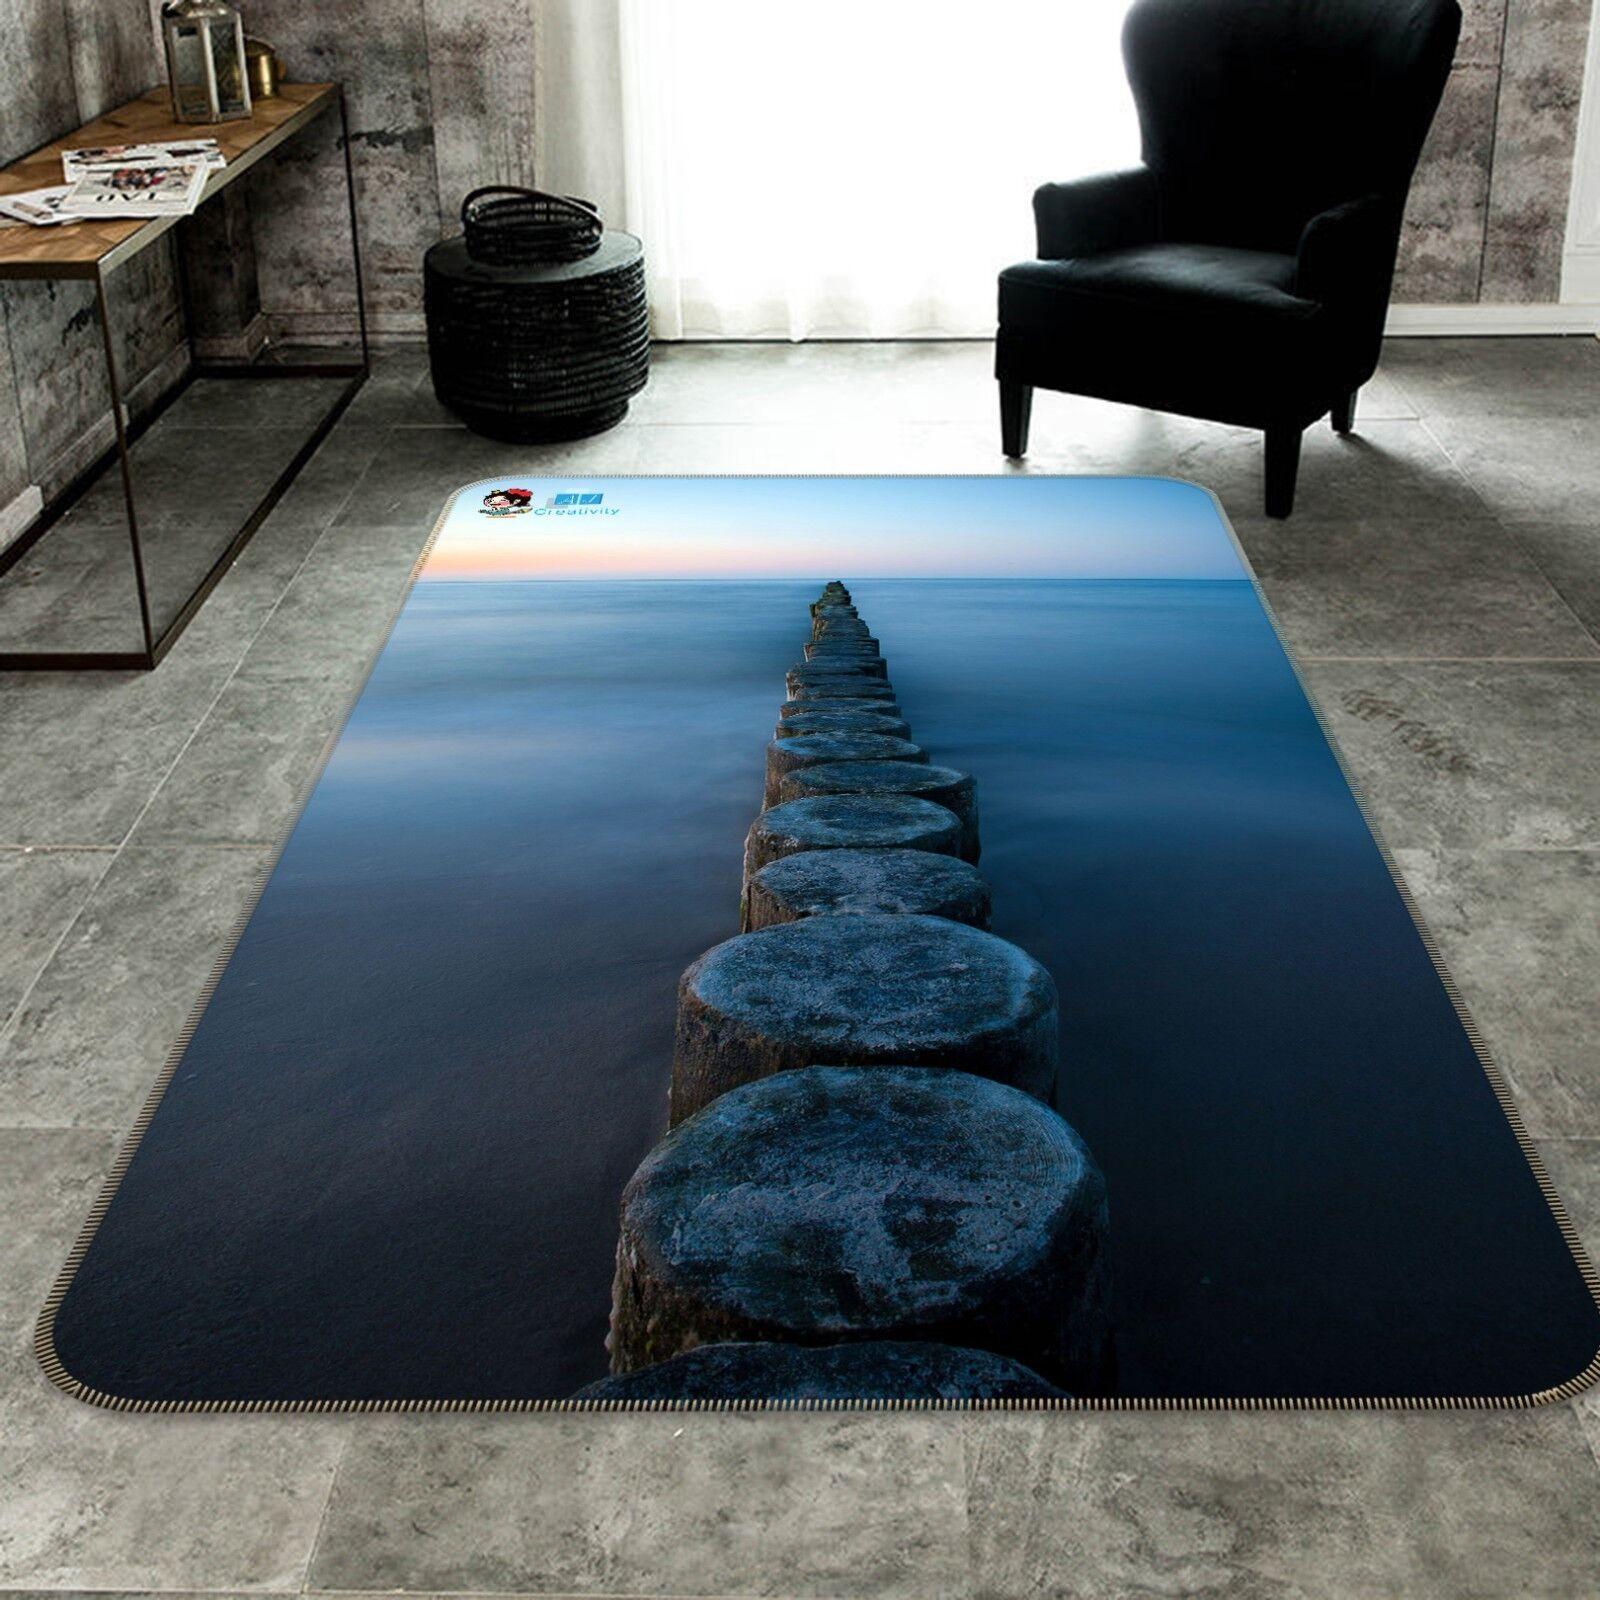 3D Pietra Ponte 312 Pavimento Antiscivolo Tappeti Elegante Tappeto IT Summer